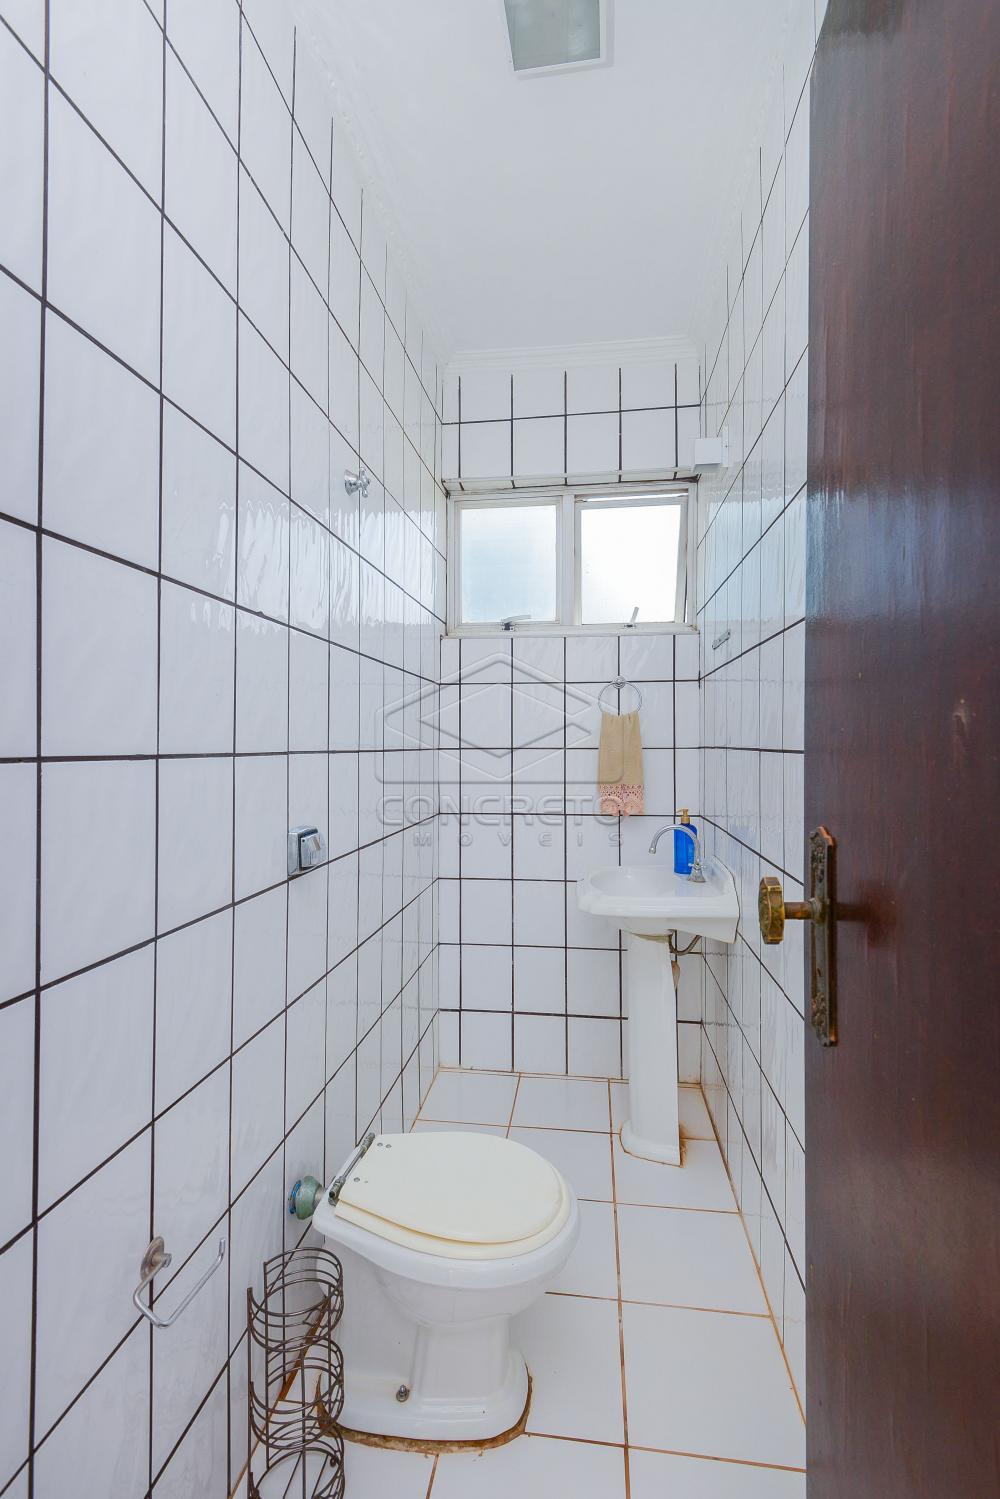 Comprar Casa / Condomínio em Bauru R$ 2.800.000,00 - Foto 33